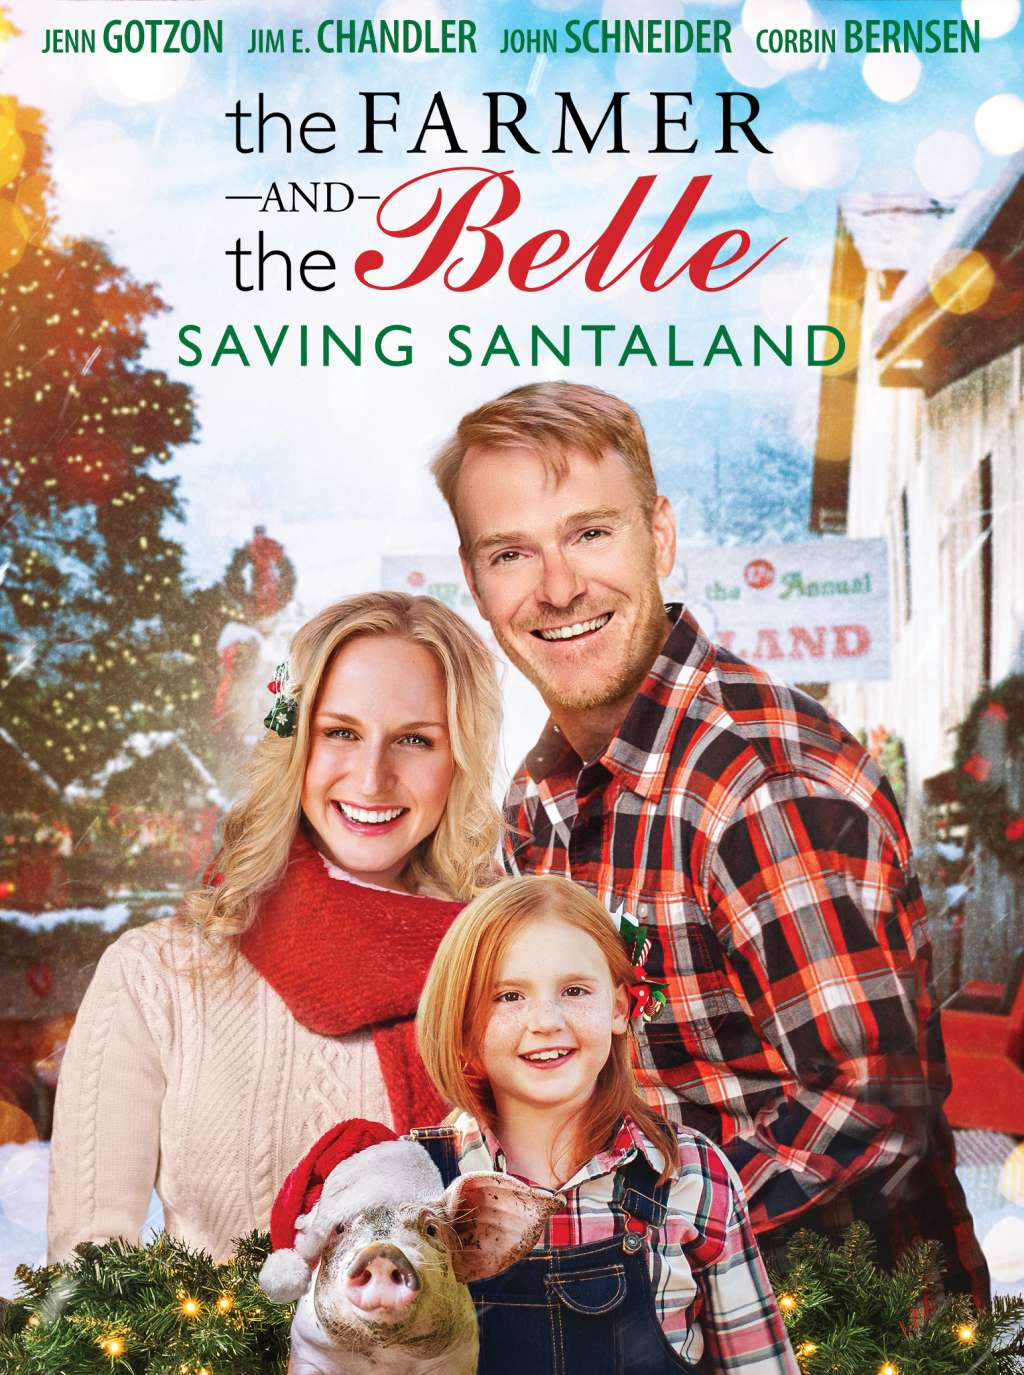 The Farmer and the Belle: Saving Santaland kapak